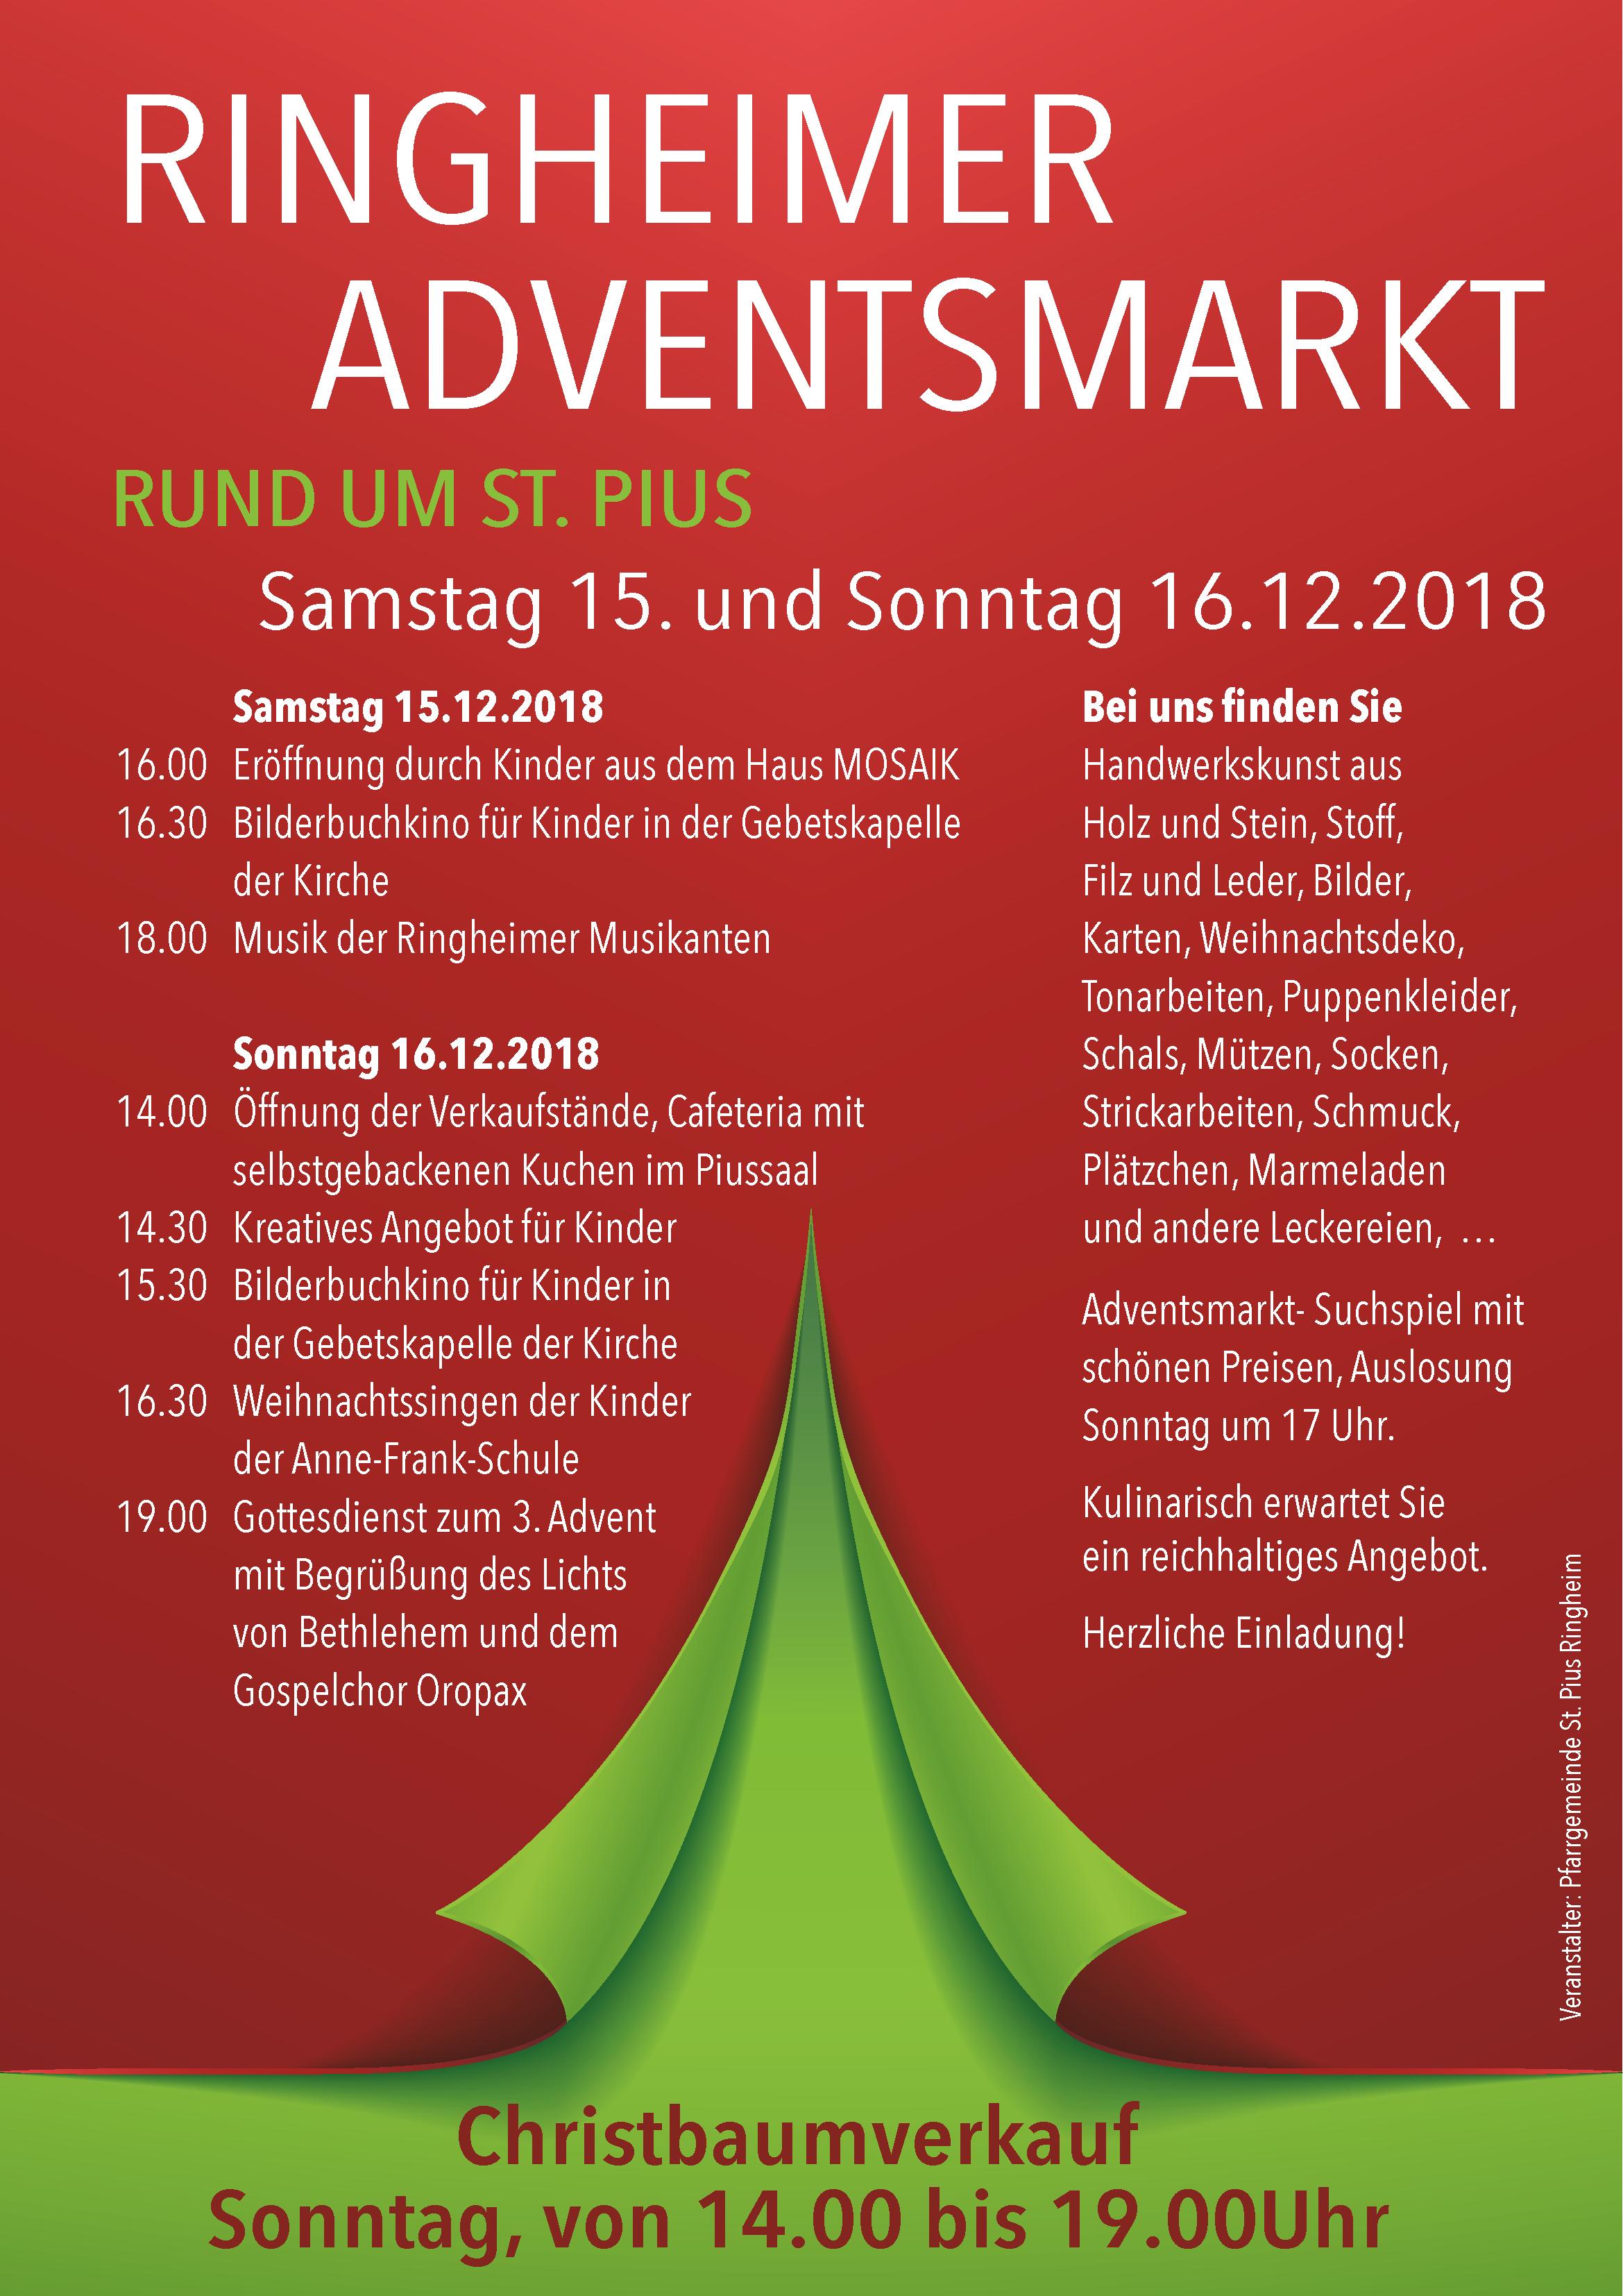 TSV Adventsmarkt 2018